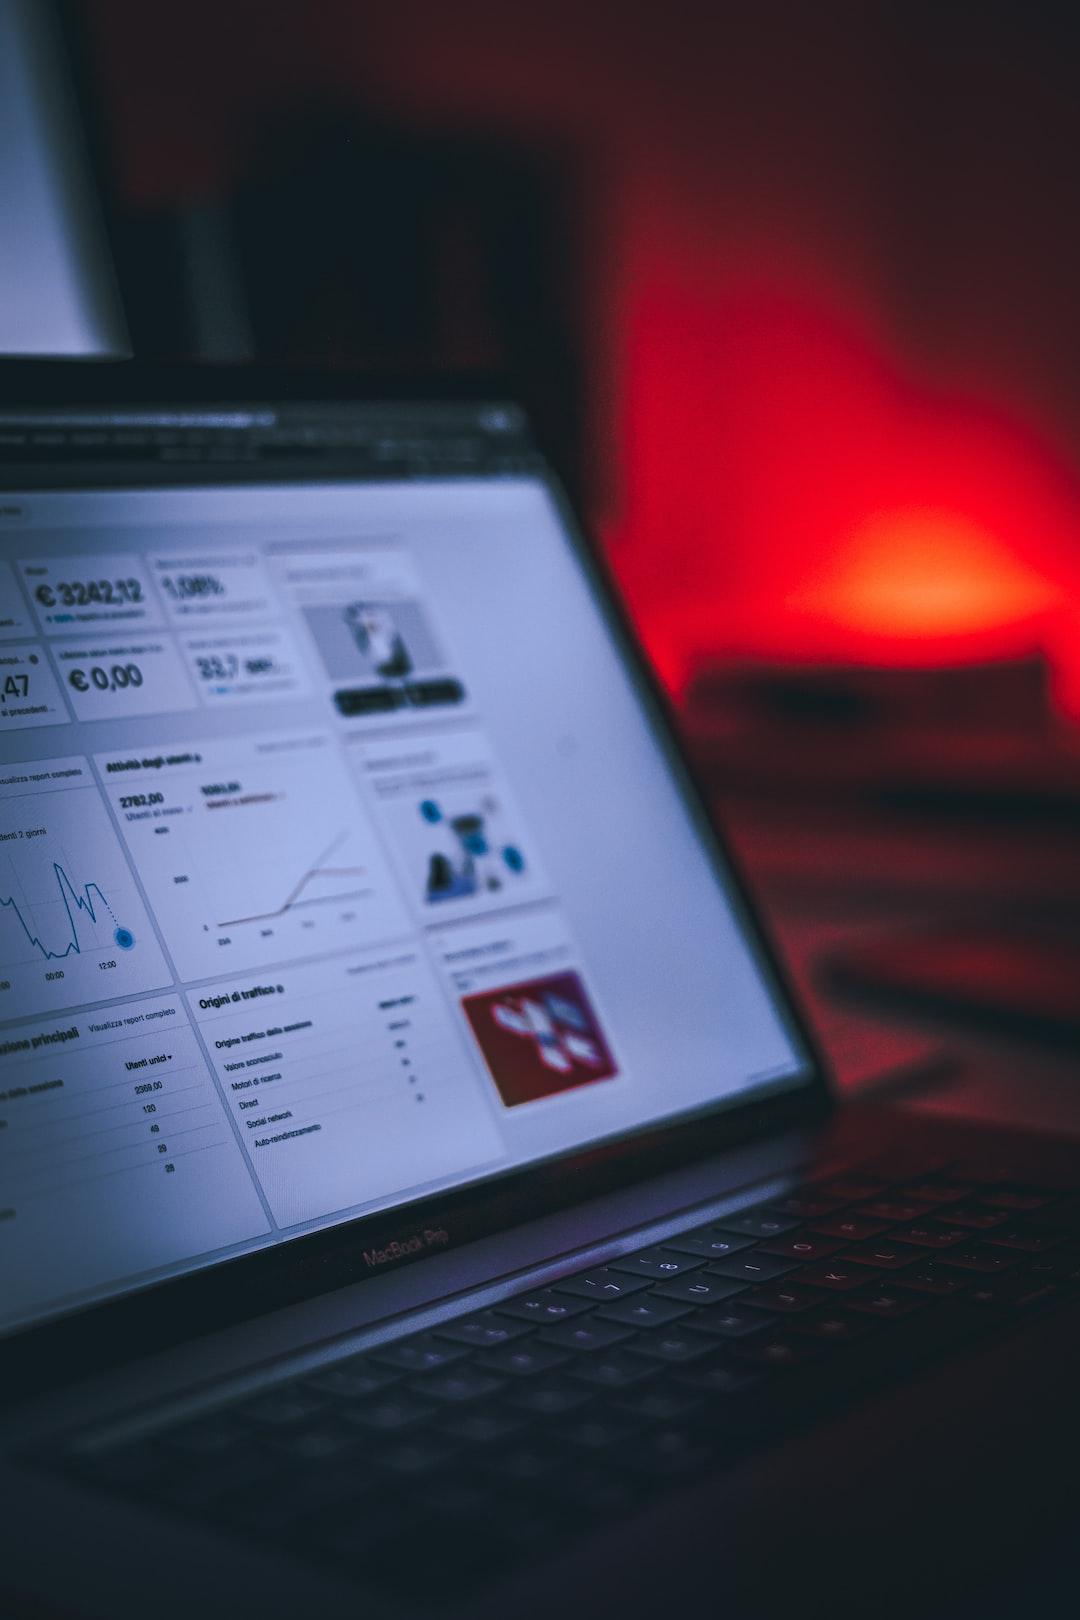 10 Latest Website Design Trends for 2021